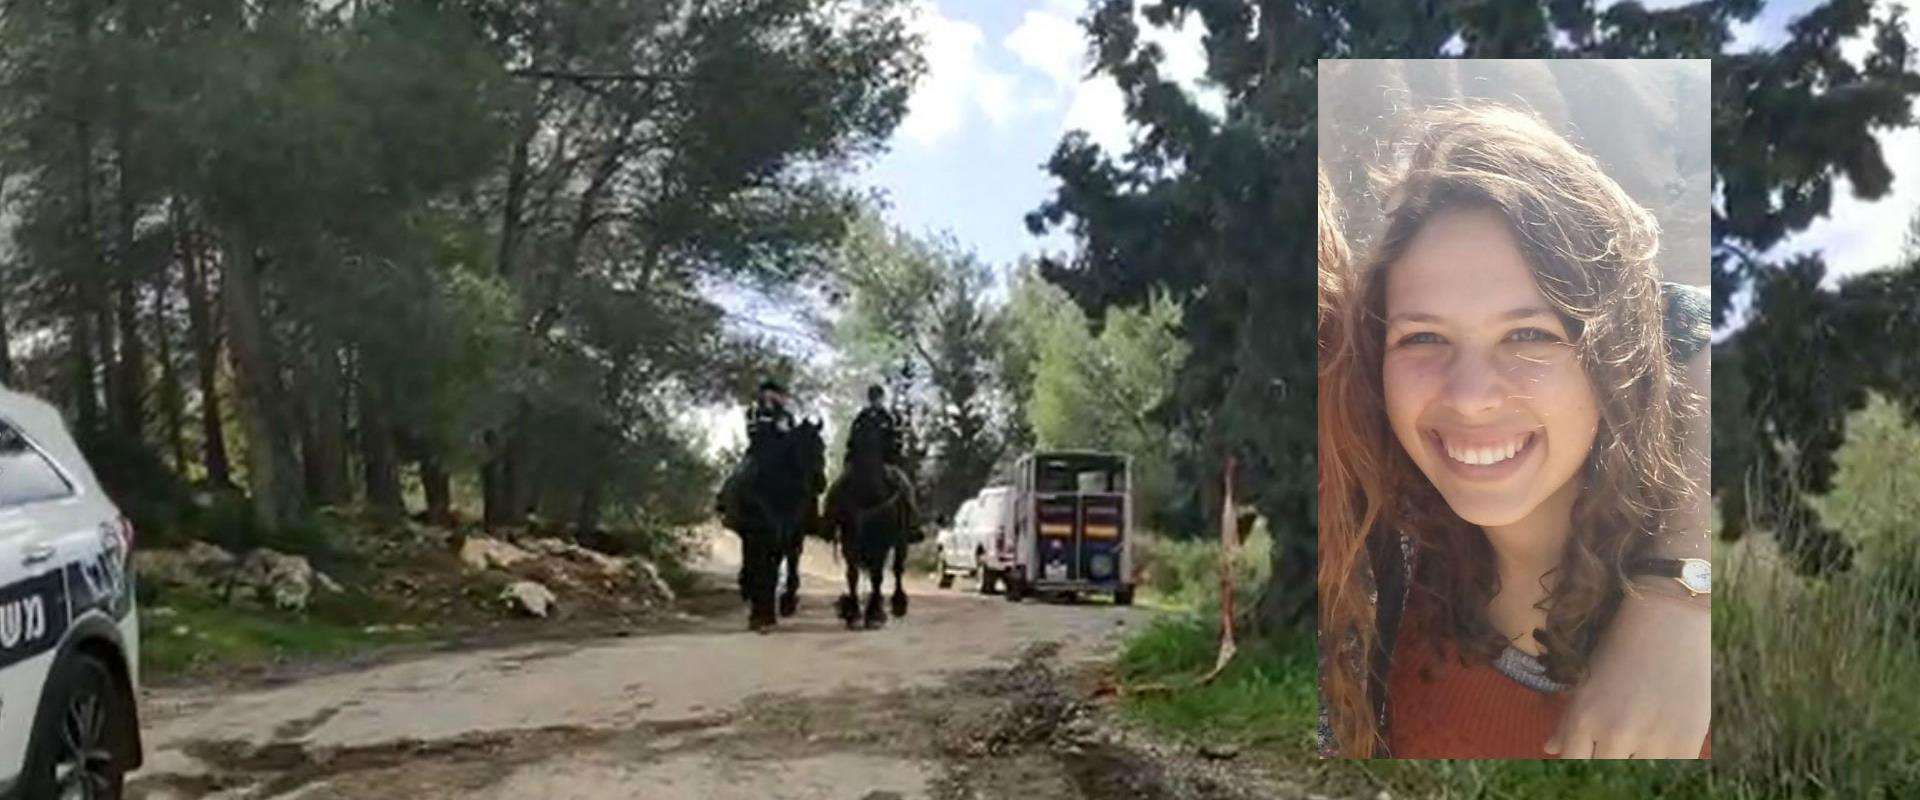 Bosque Ein Yael Jerusalem 2